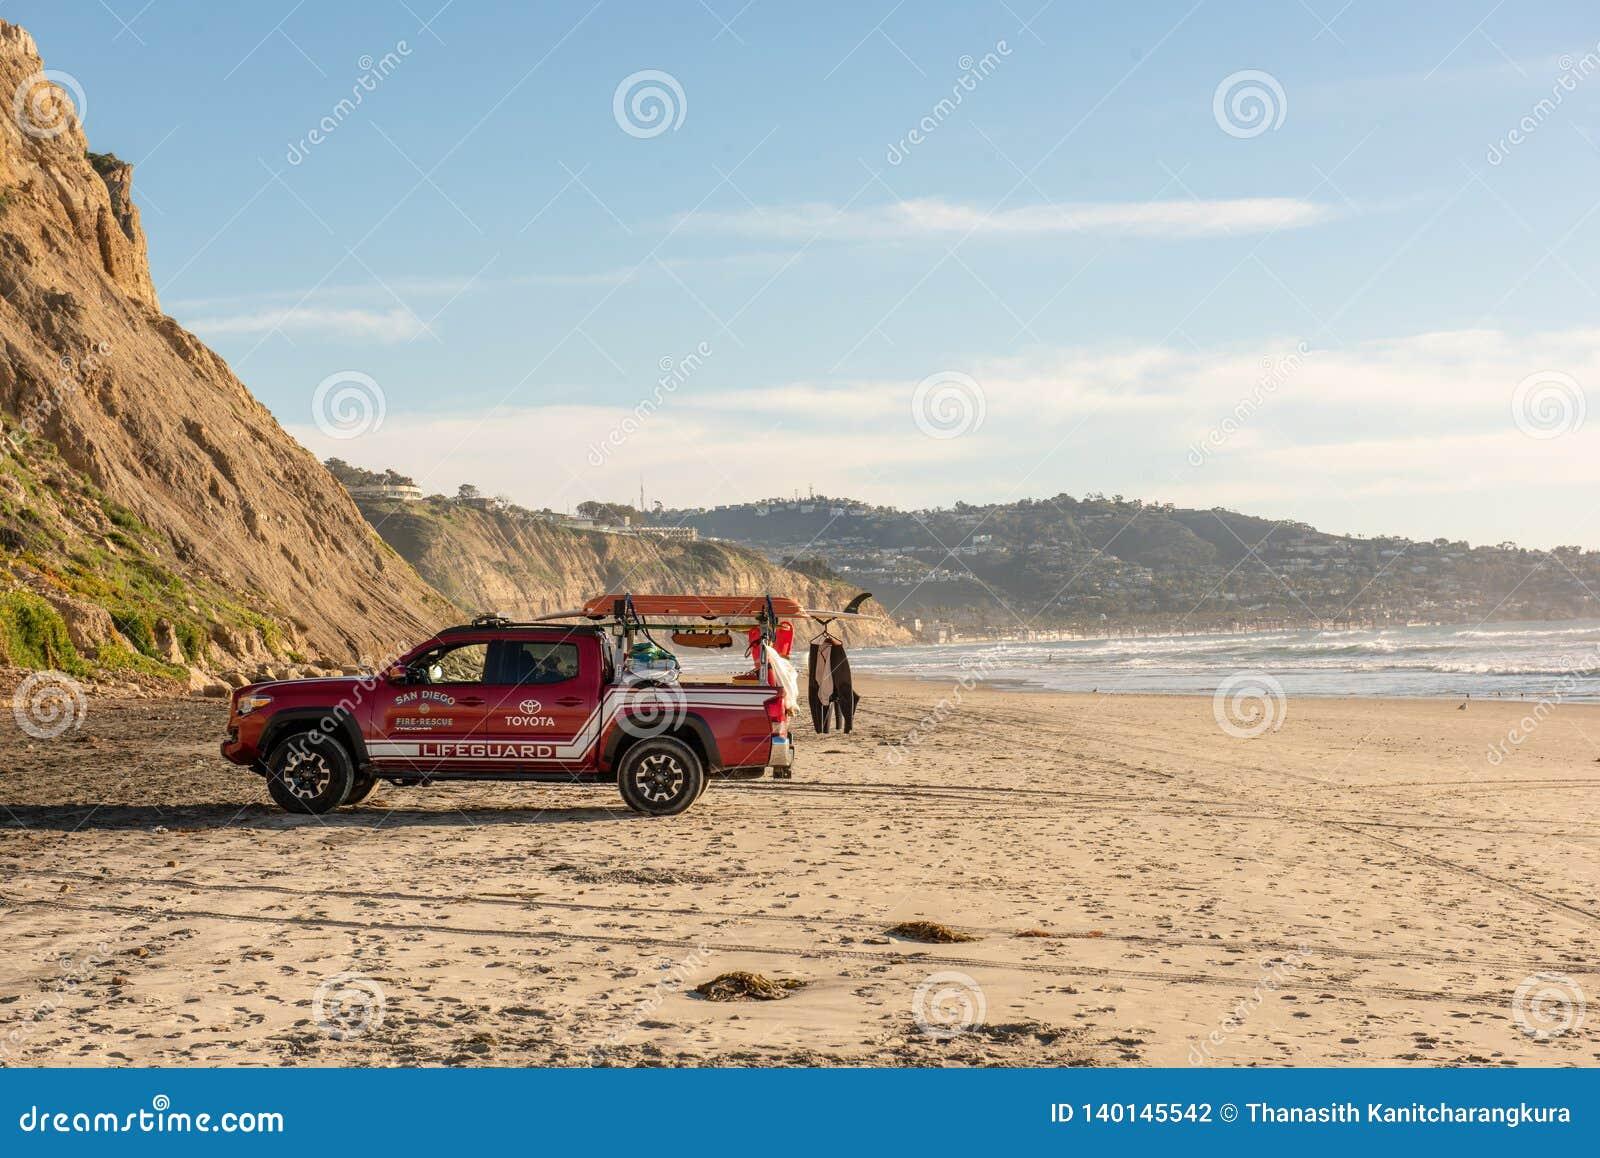 SAN DIEGO, USA - FEB 20 2019: Toyata vehicle lifeguard at Black`s Beach in San Diego, California